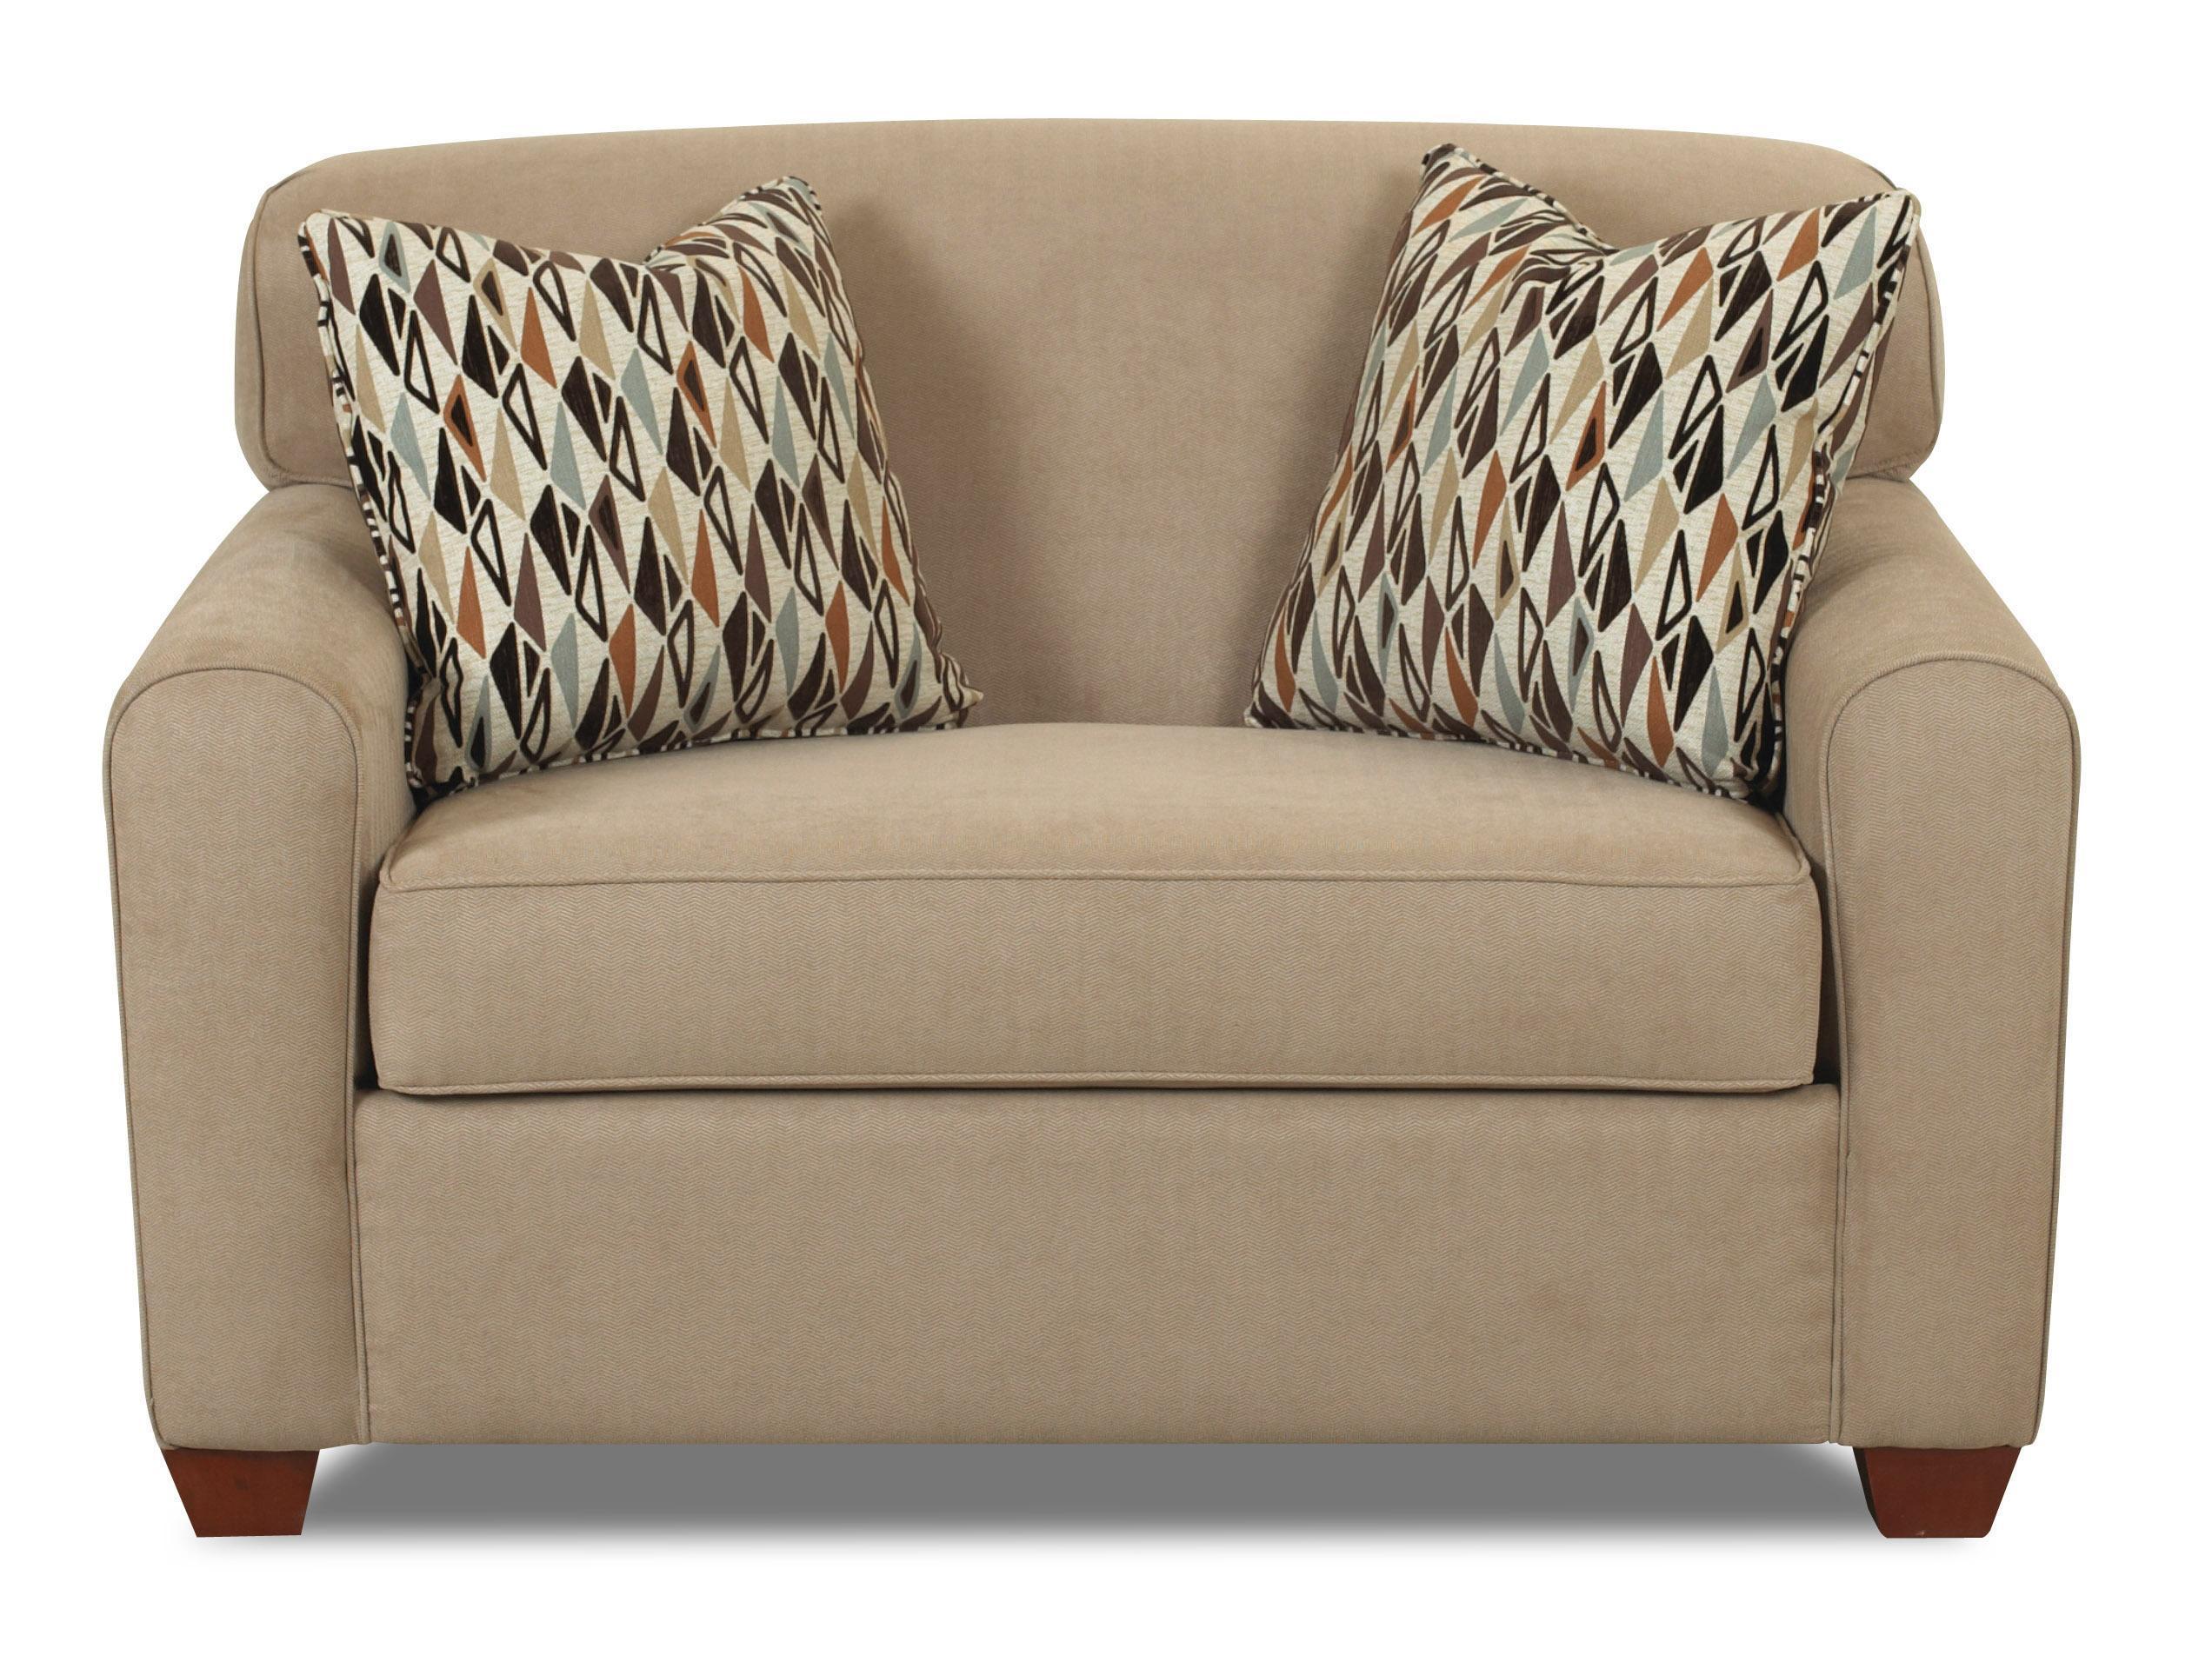 Zuma  Sleeper Chair w/ Dreamquest Mattress by Klaussner at Johnny Janosik